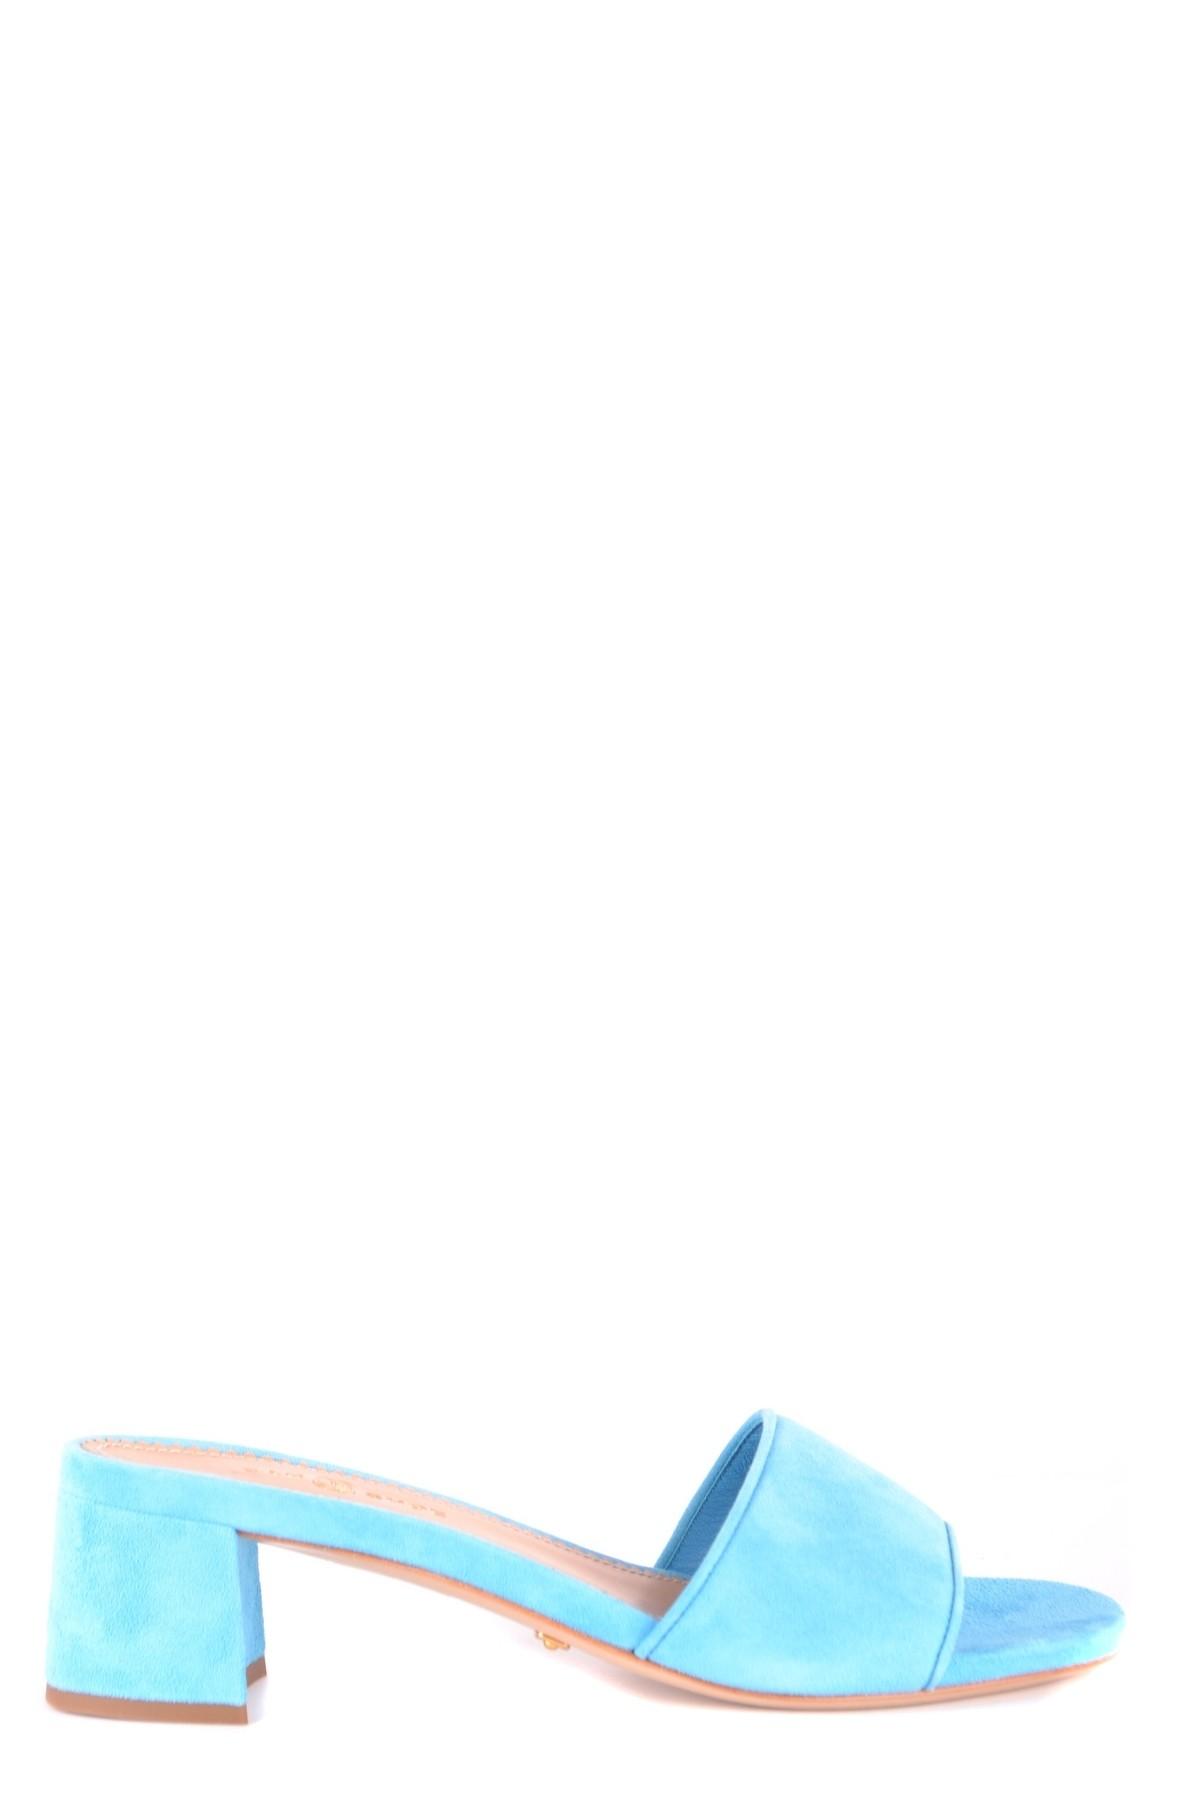 car shoeMarchio: Car Shoe; Genere: Donna; Tipologia: Ciab…